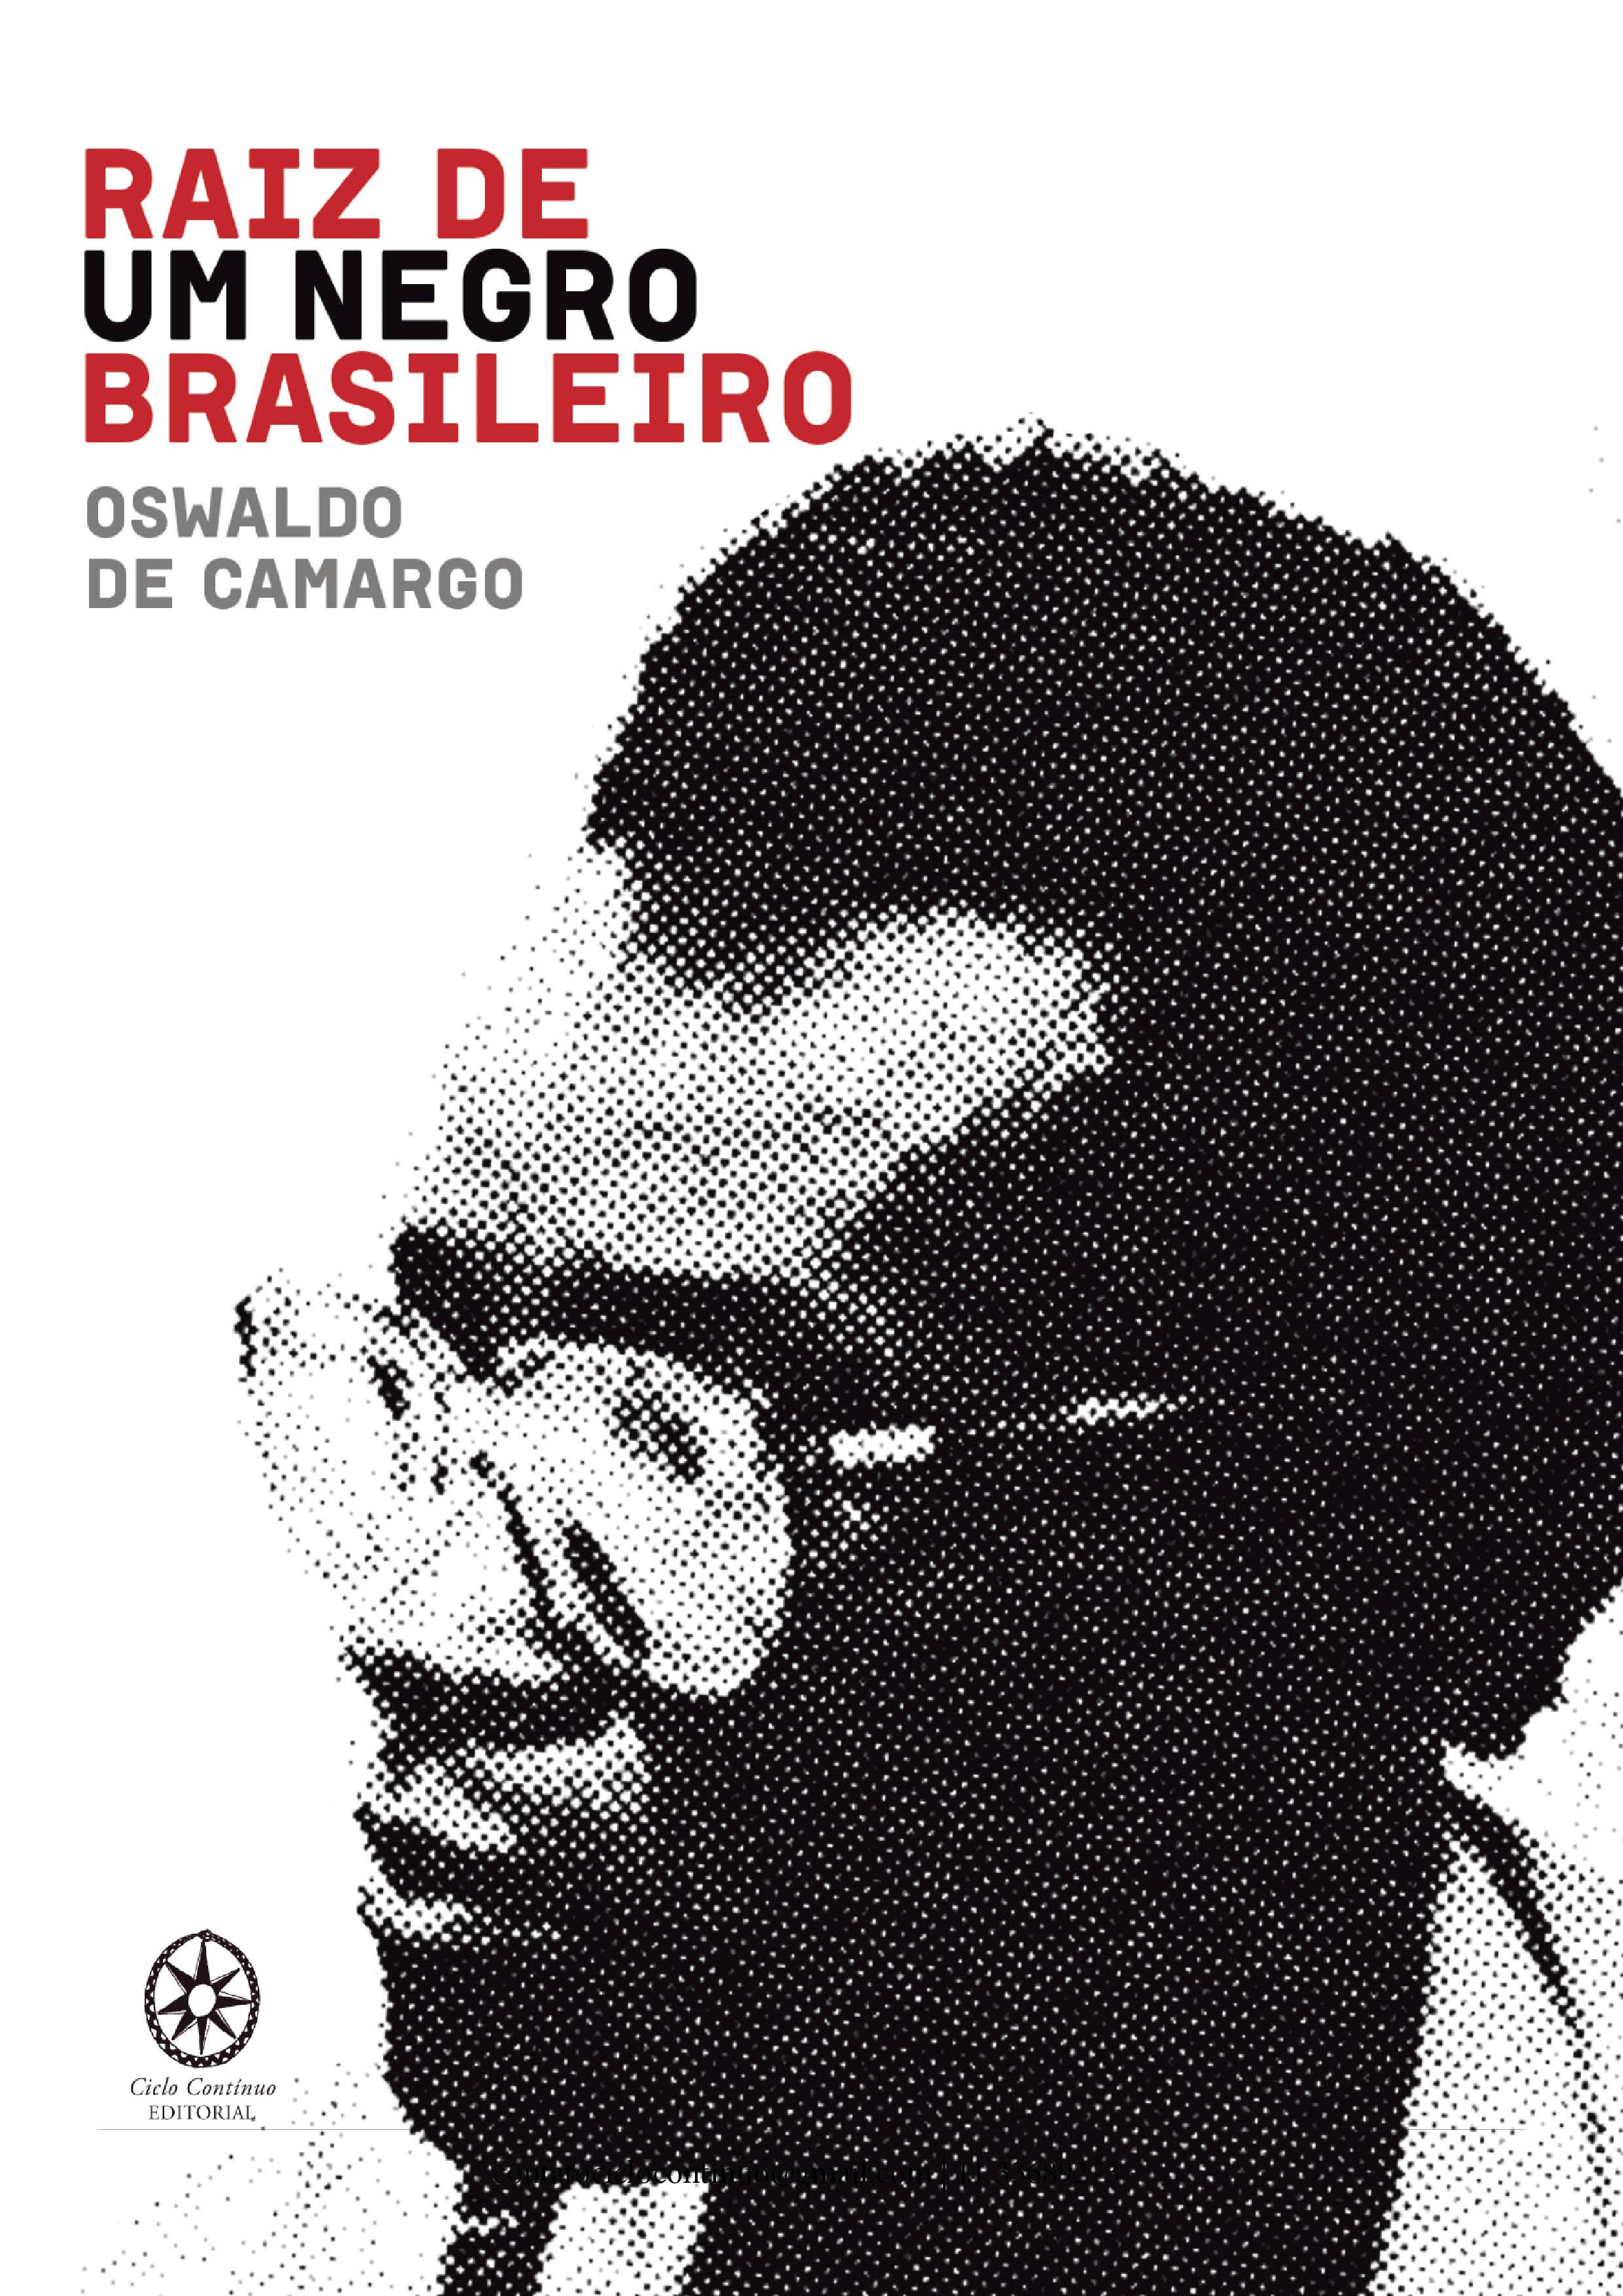 Raíz de um negro brasileiro